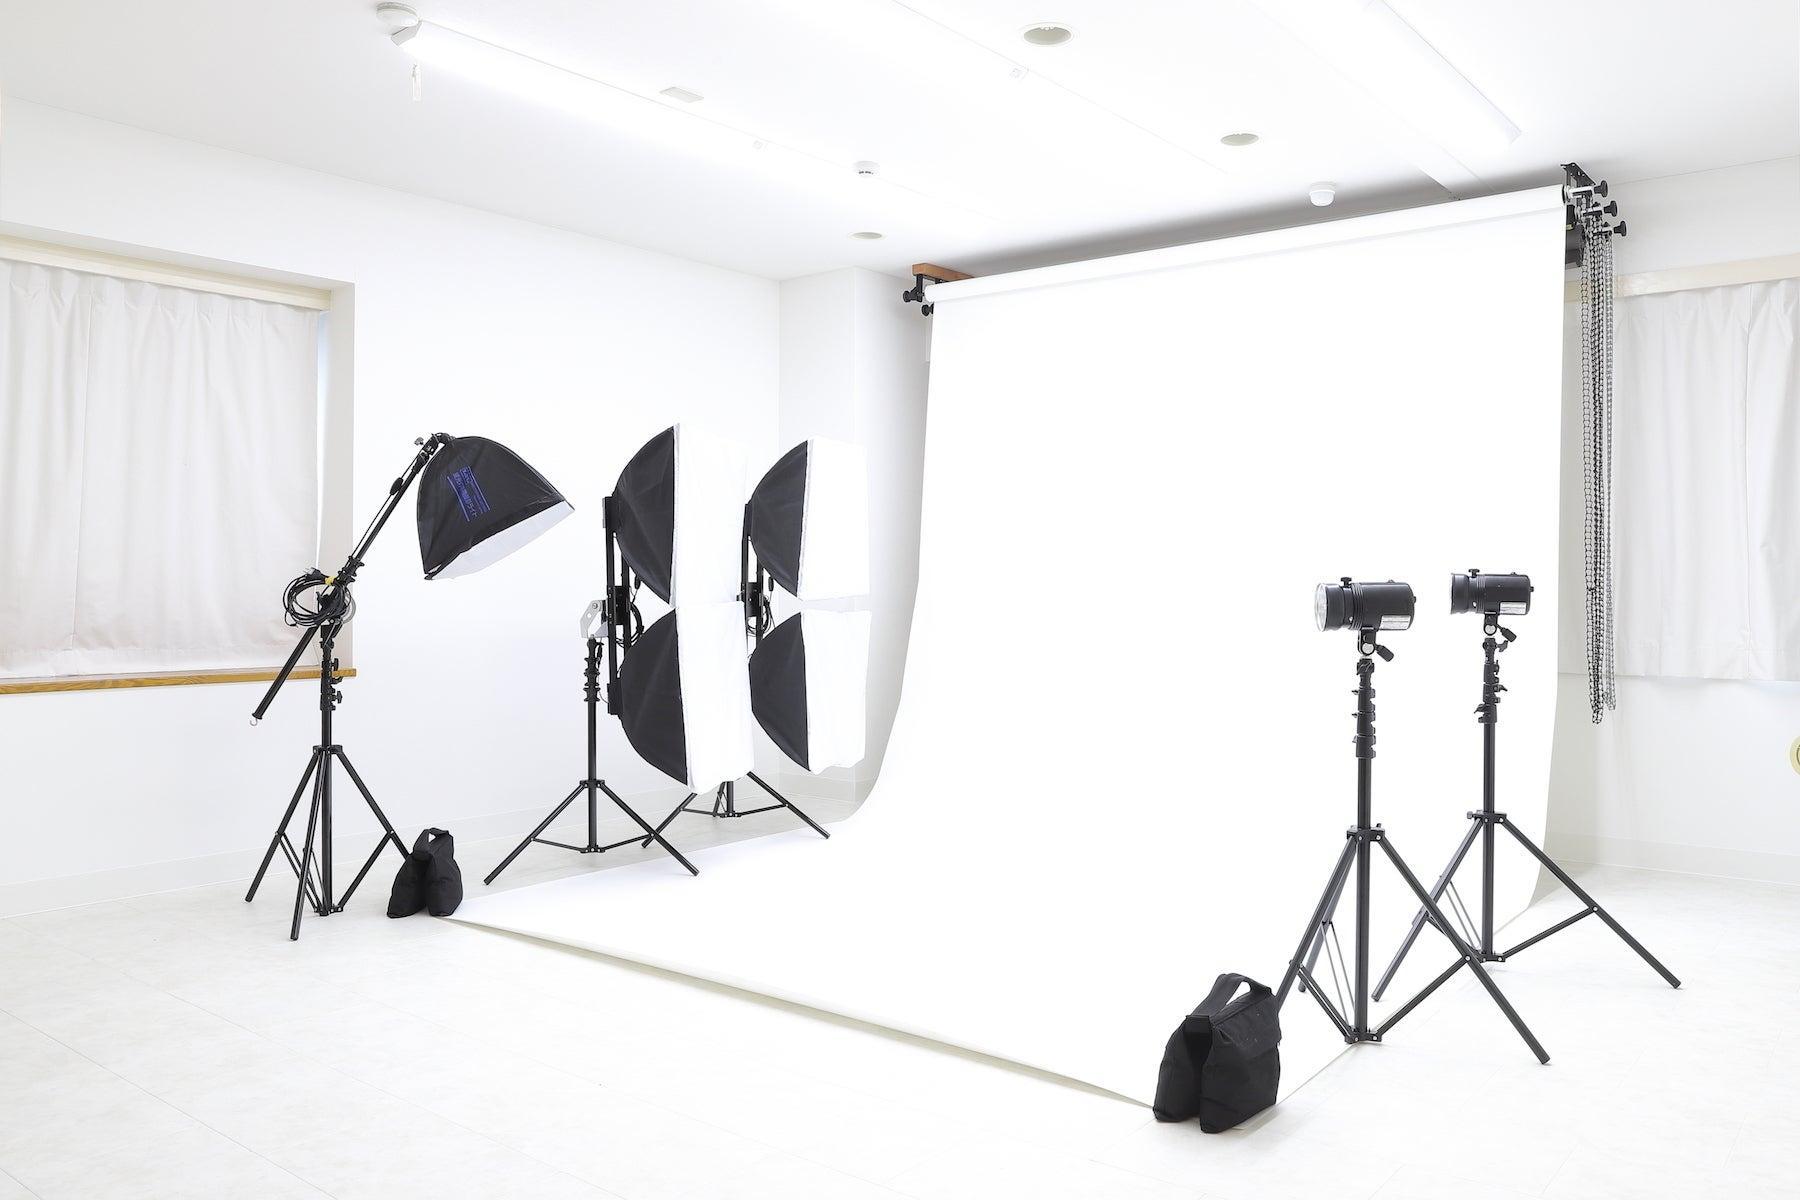 【studio switch】ヨガや会議等の多目的利用・9種類の背景が選べる撮影利用の2プランから選べる! の写真